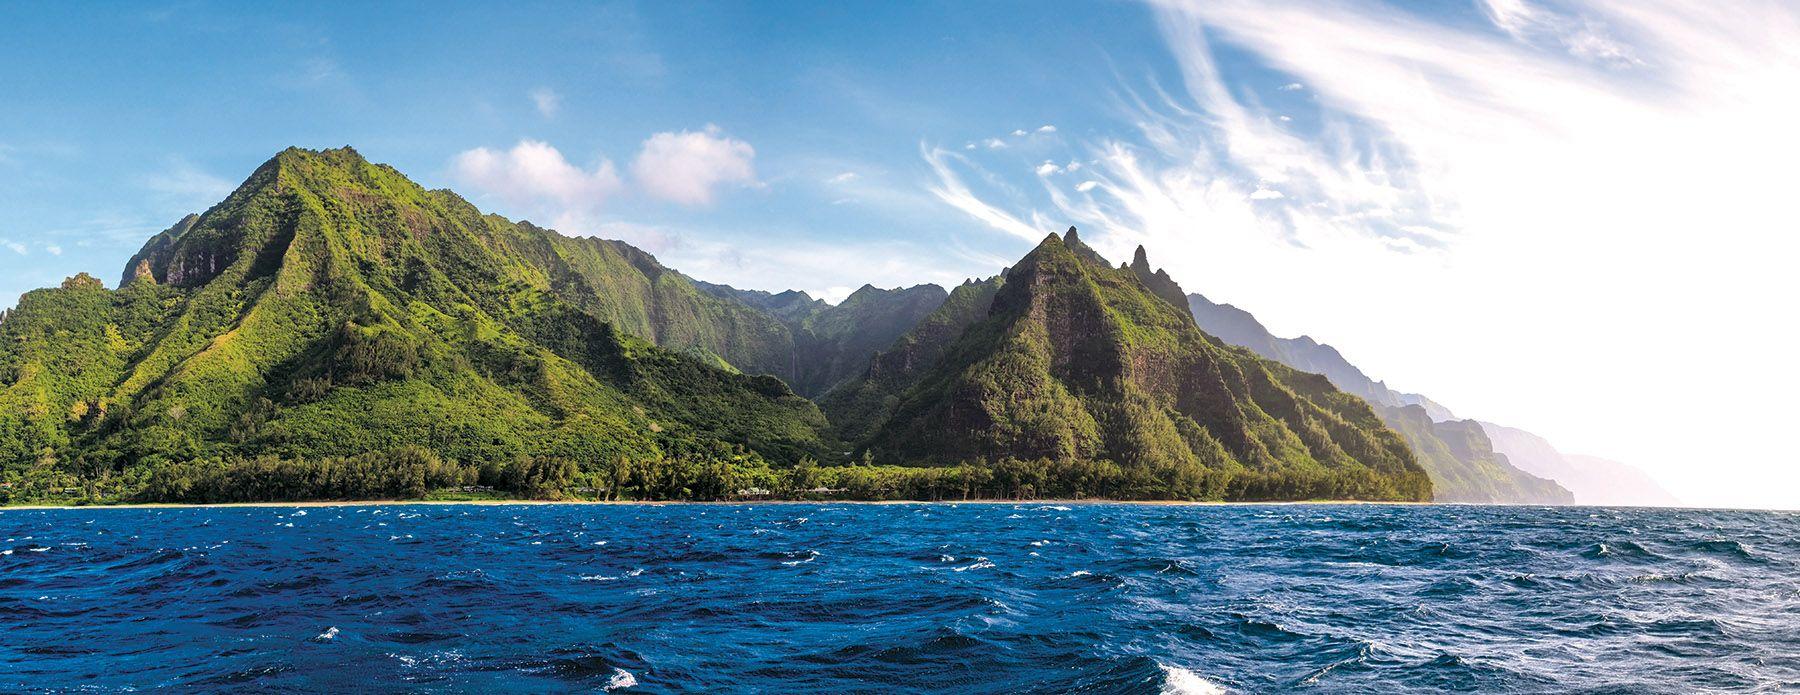 site de rencontres en ligne Hawaii